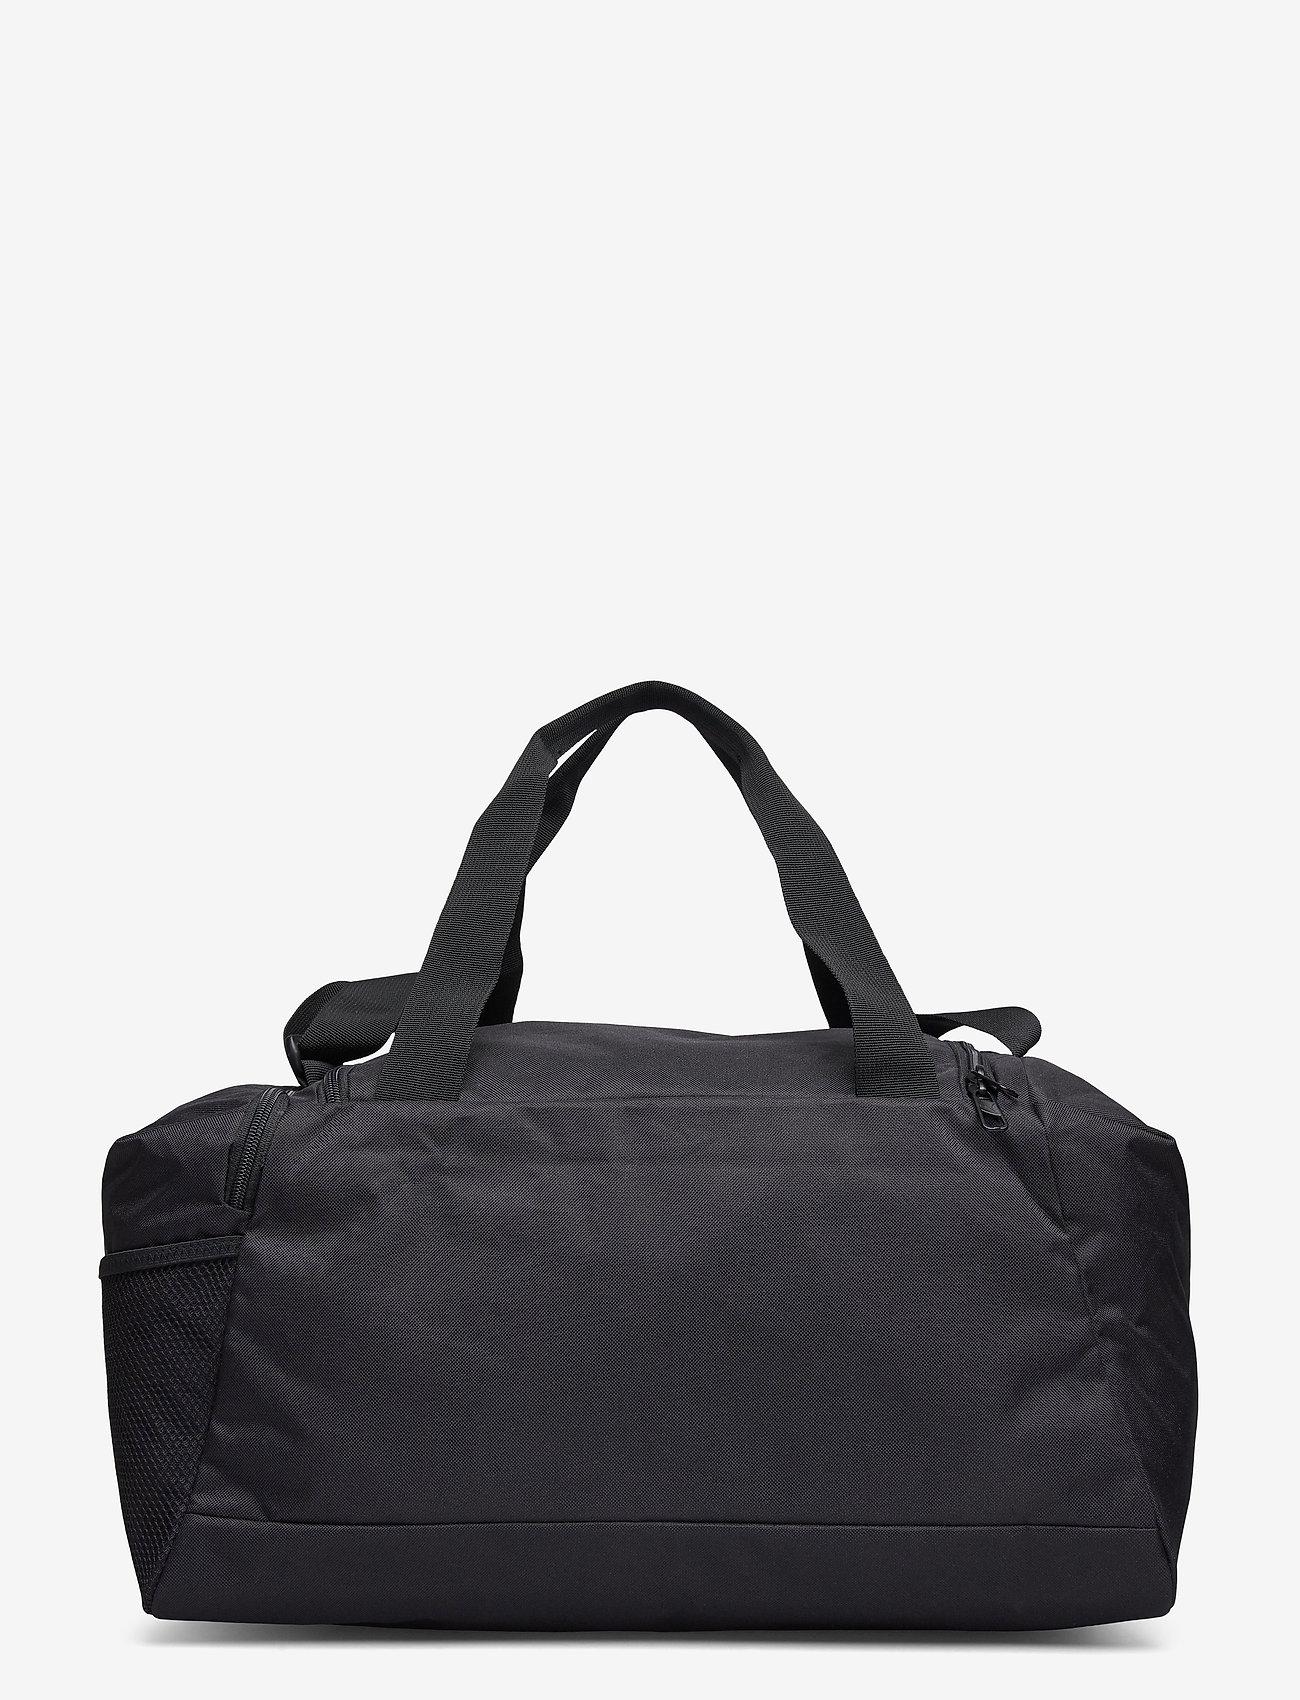 PUMA - Fundamentals Sports Bag S - trainingstaschen - puma black - 1